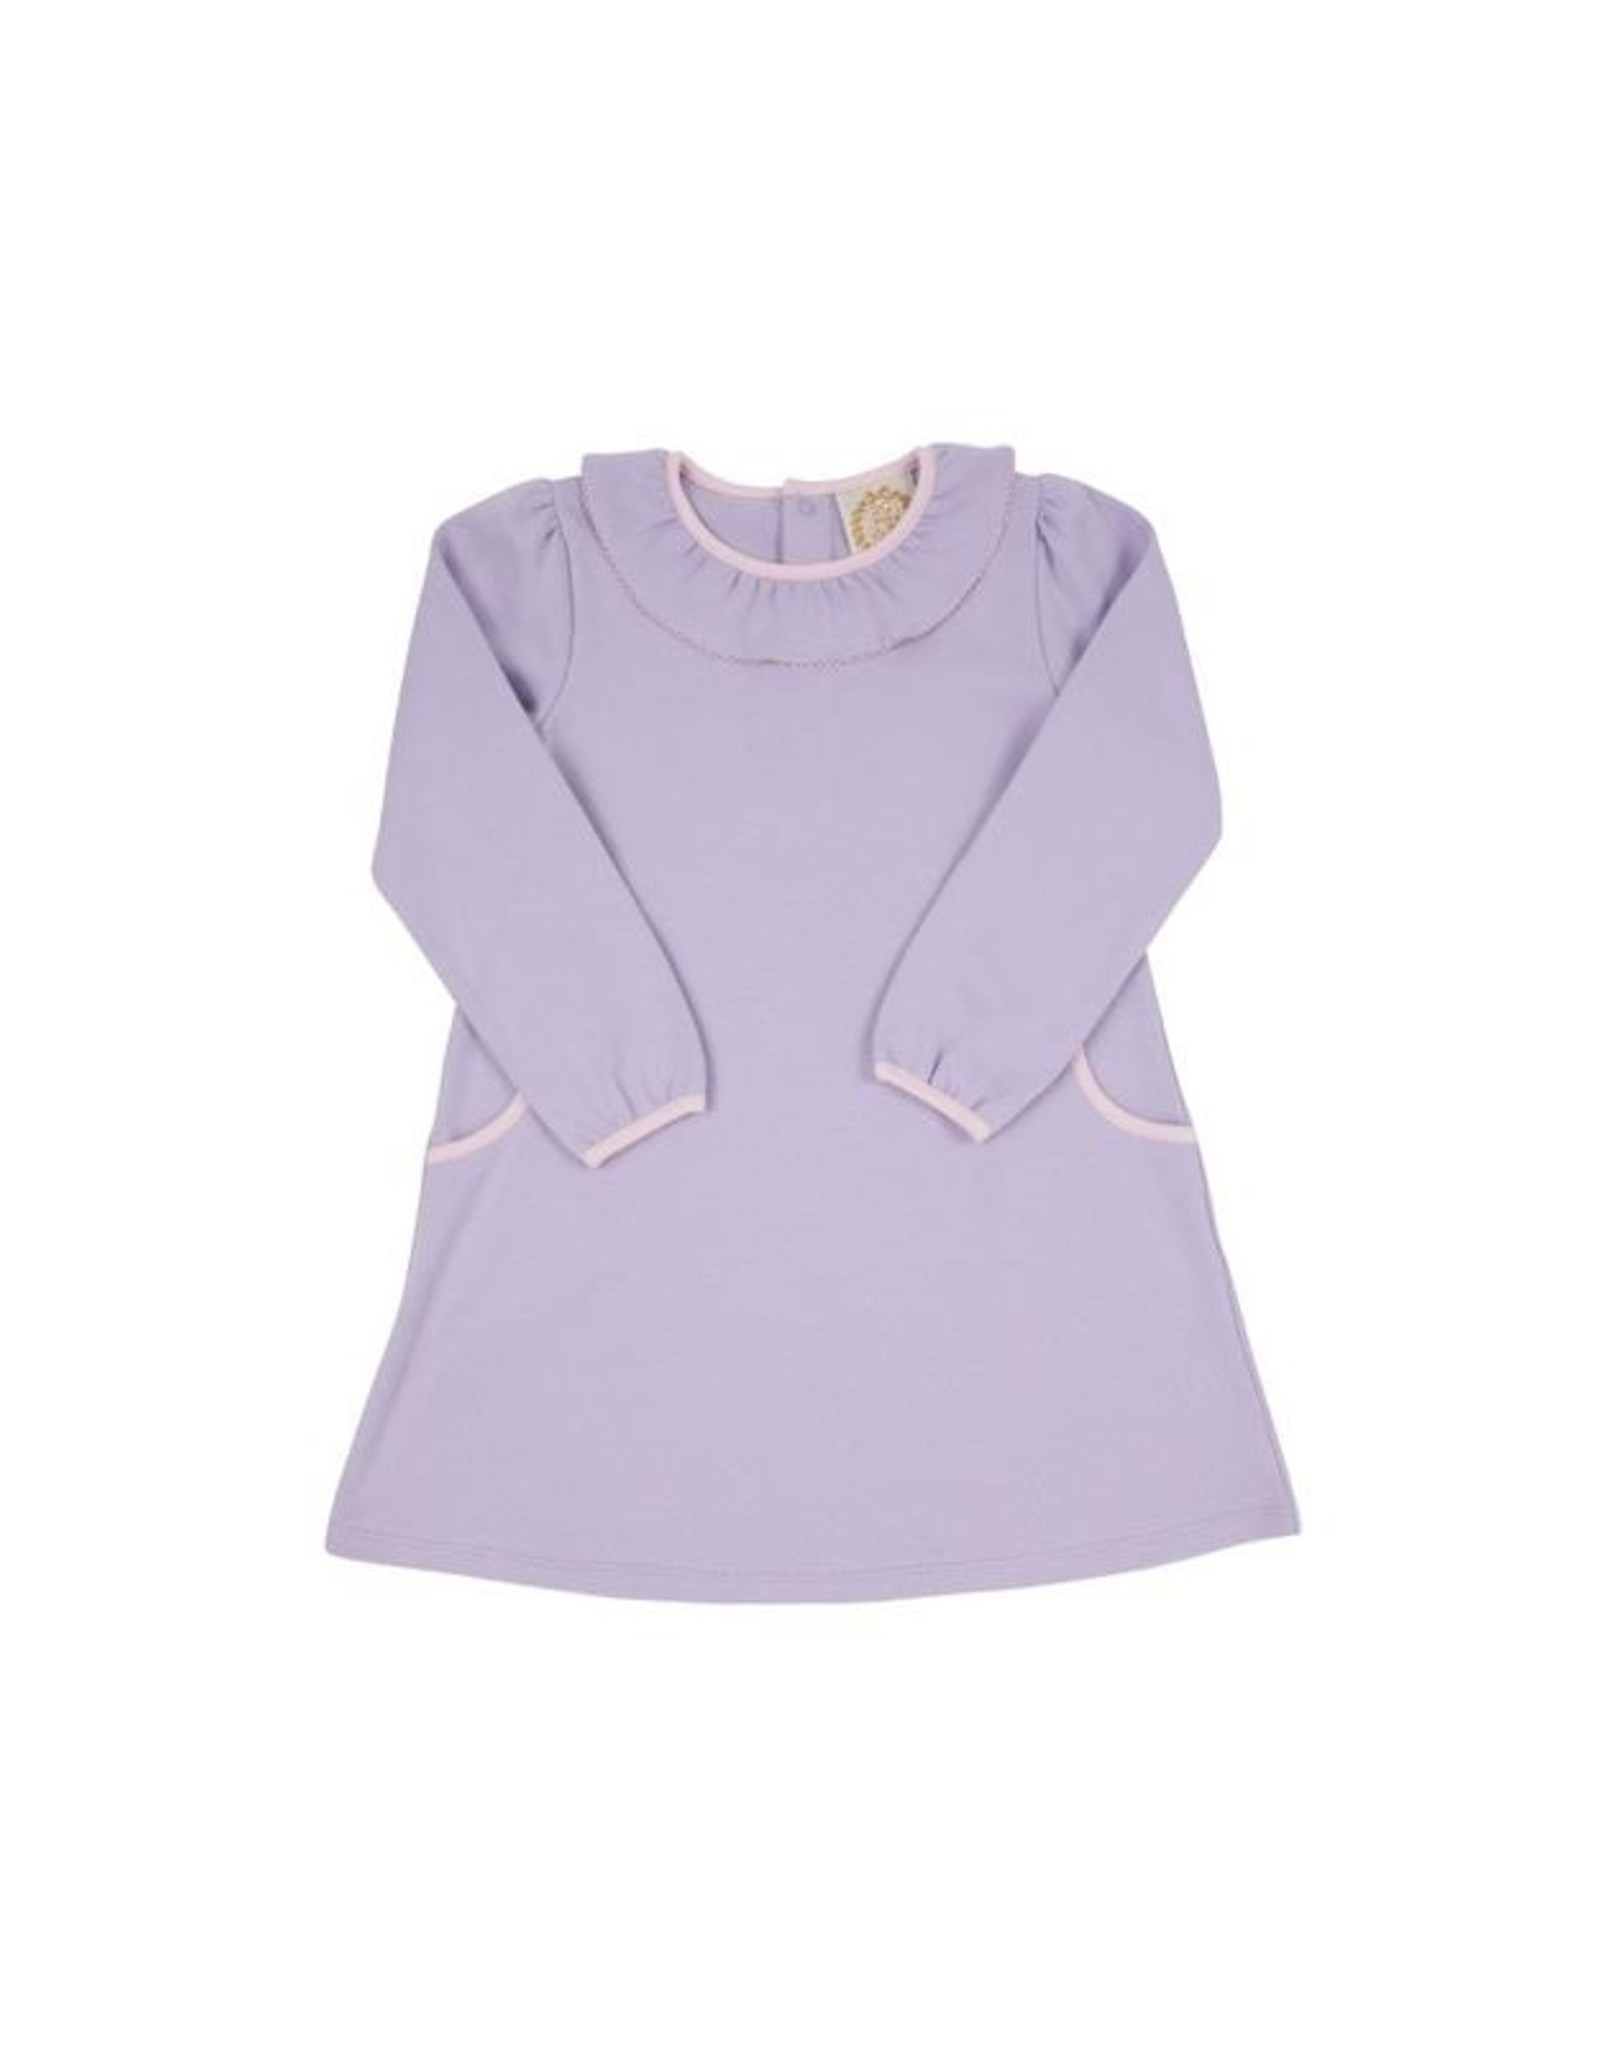 The Beaufort Bonnet Company Ramona Ruffle Dress, Lauderdale Lavender